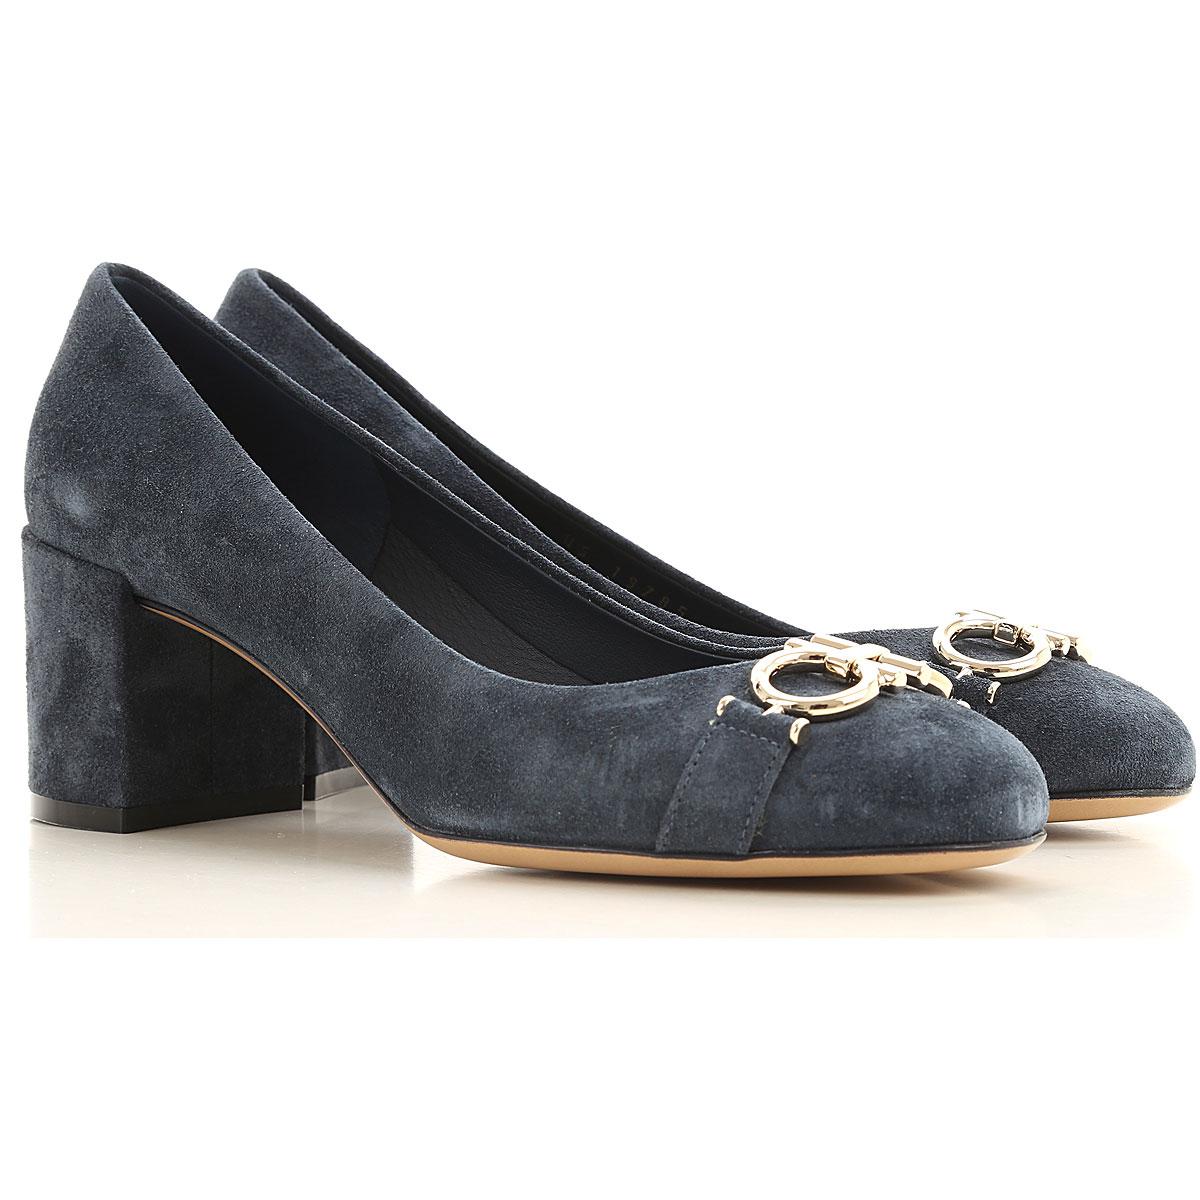 Salvatore Ferragamo Pumps & High Heels for Women On Sale, Blu Navy, Suede leather, 2019, 5 5.5 6 6.5 7 8 8.5 9.5